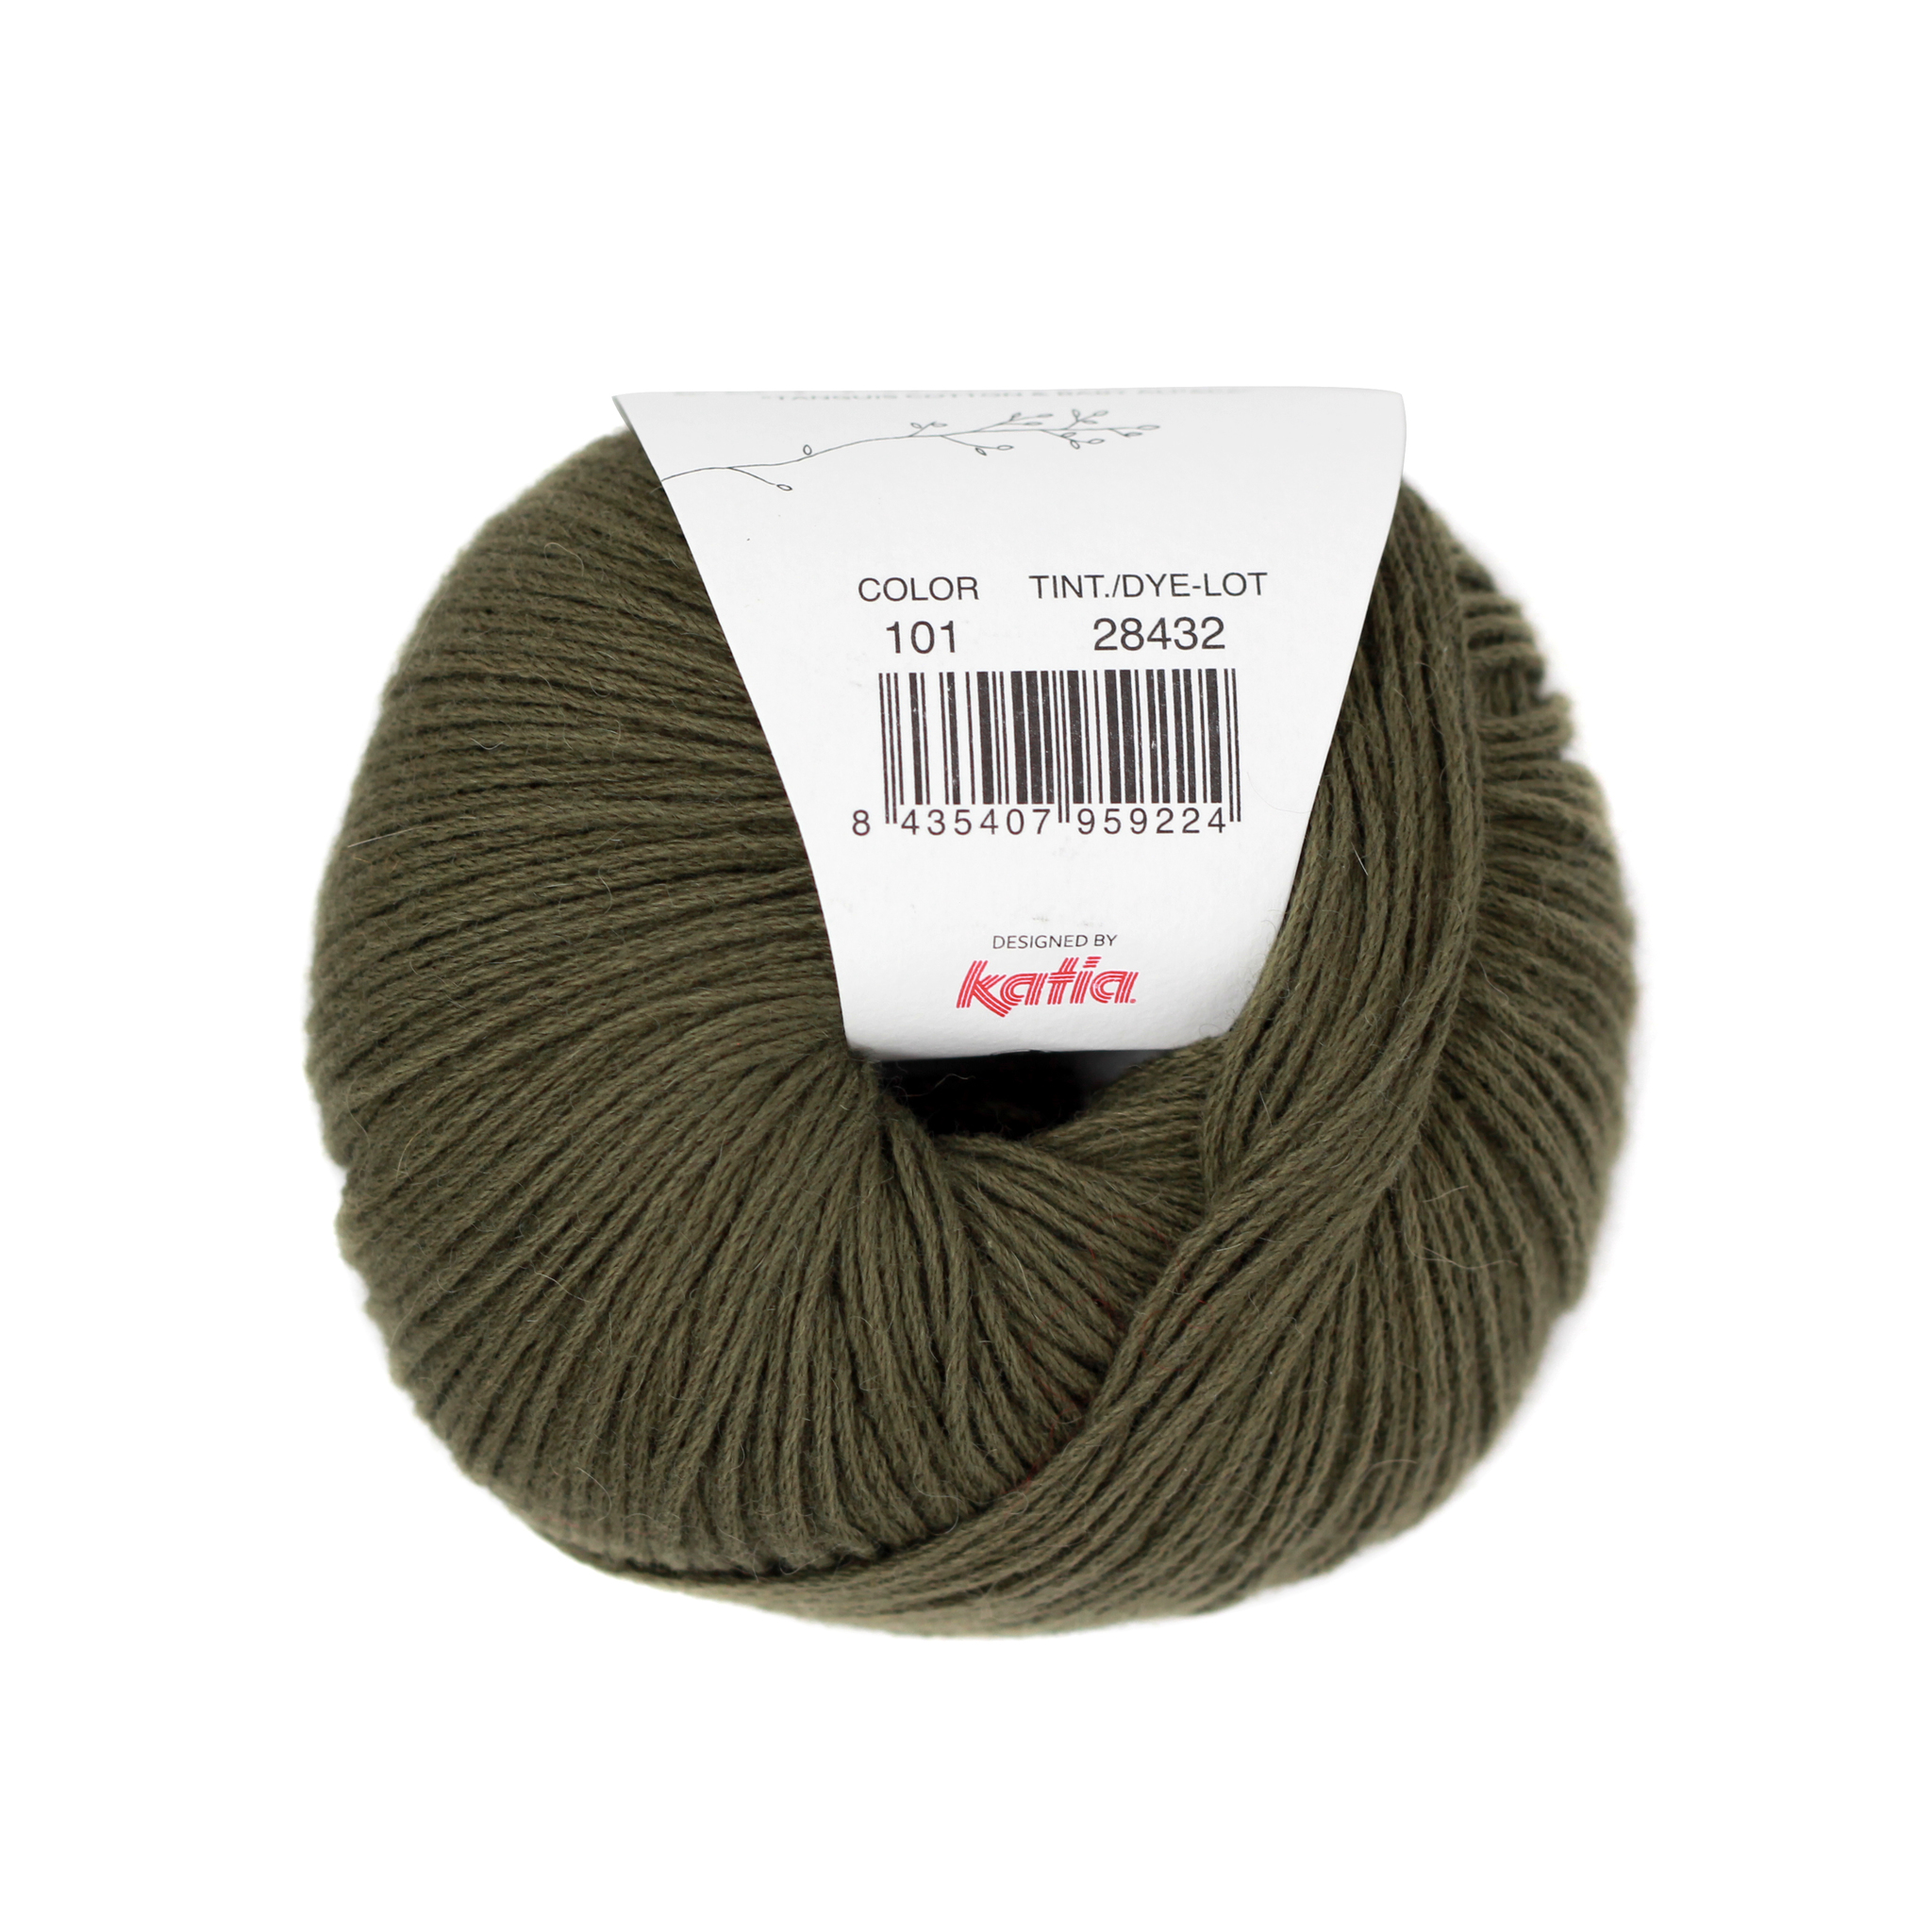 Katia Concept Cotton-Alpaca - 101